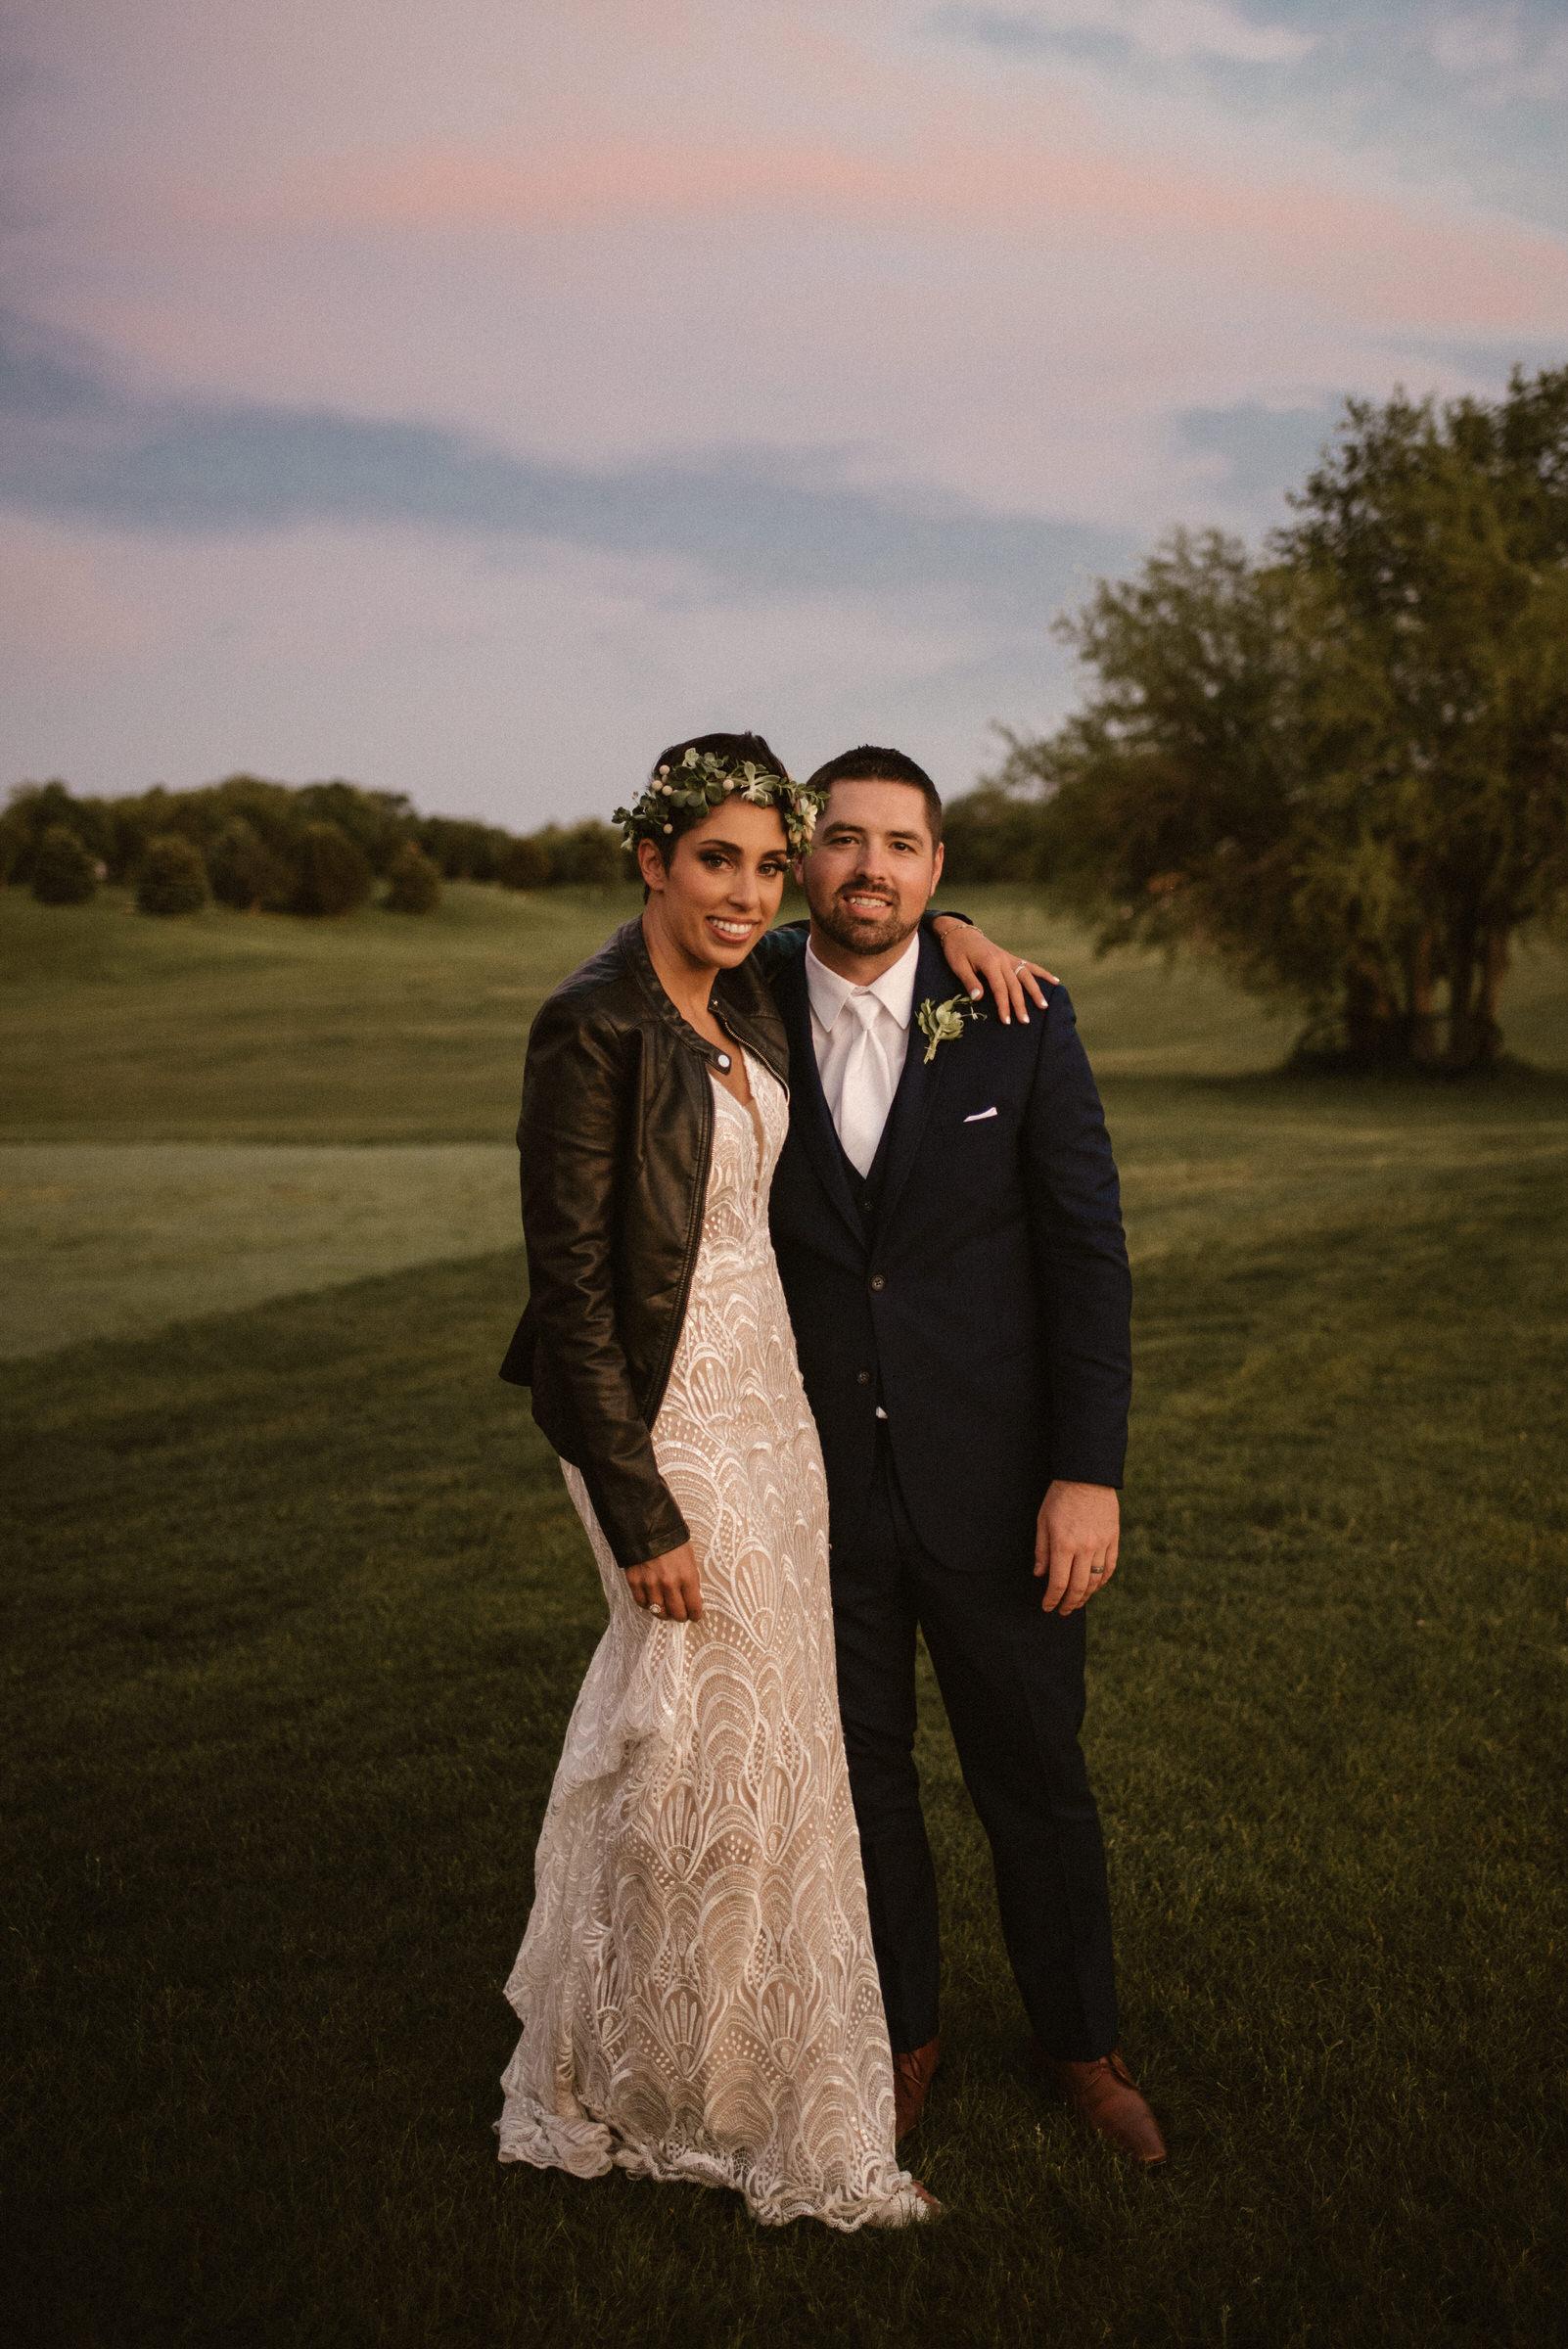 Wilderness-Ridge-Lincoln-Nebraska-Wedding-Kaylie-Sirek-Photography-127.jpg